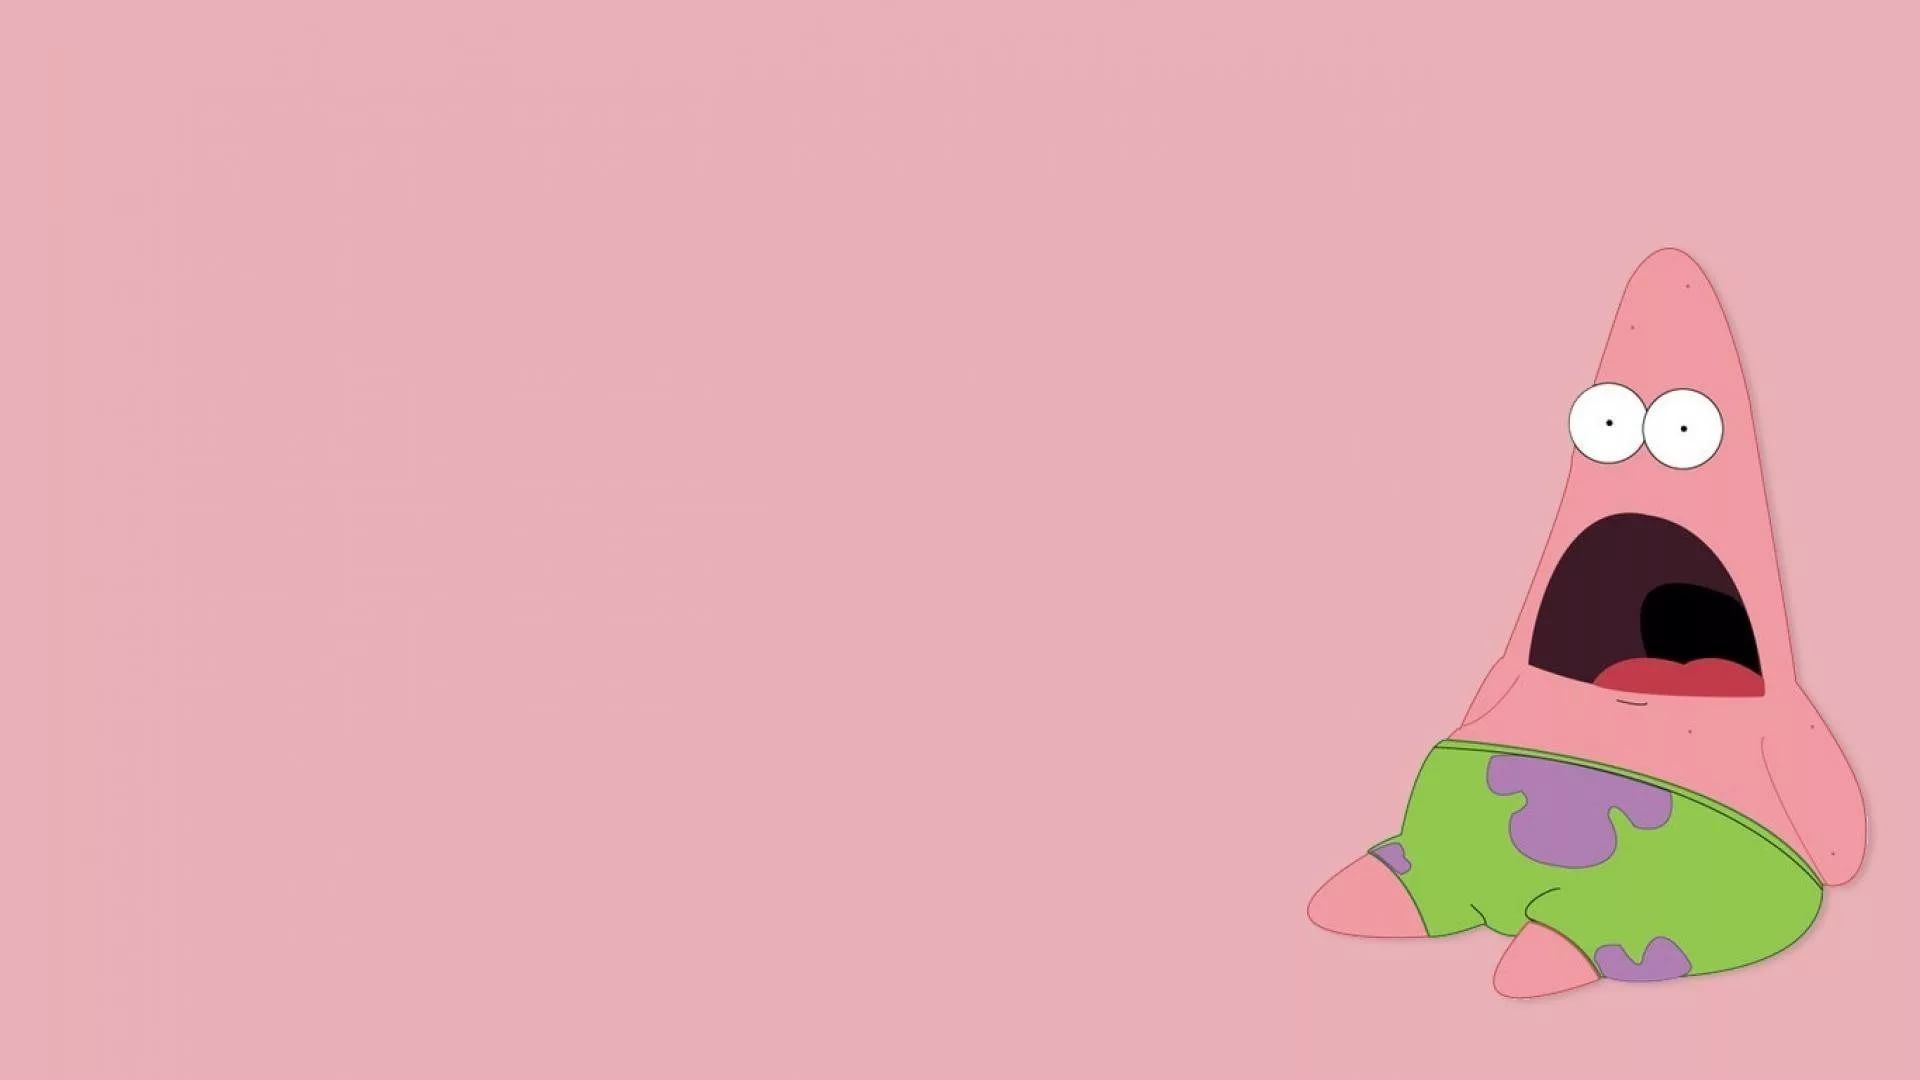 Patrick desktop wallpaper